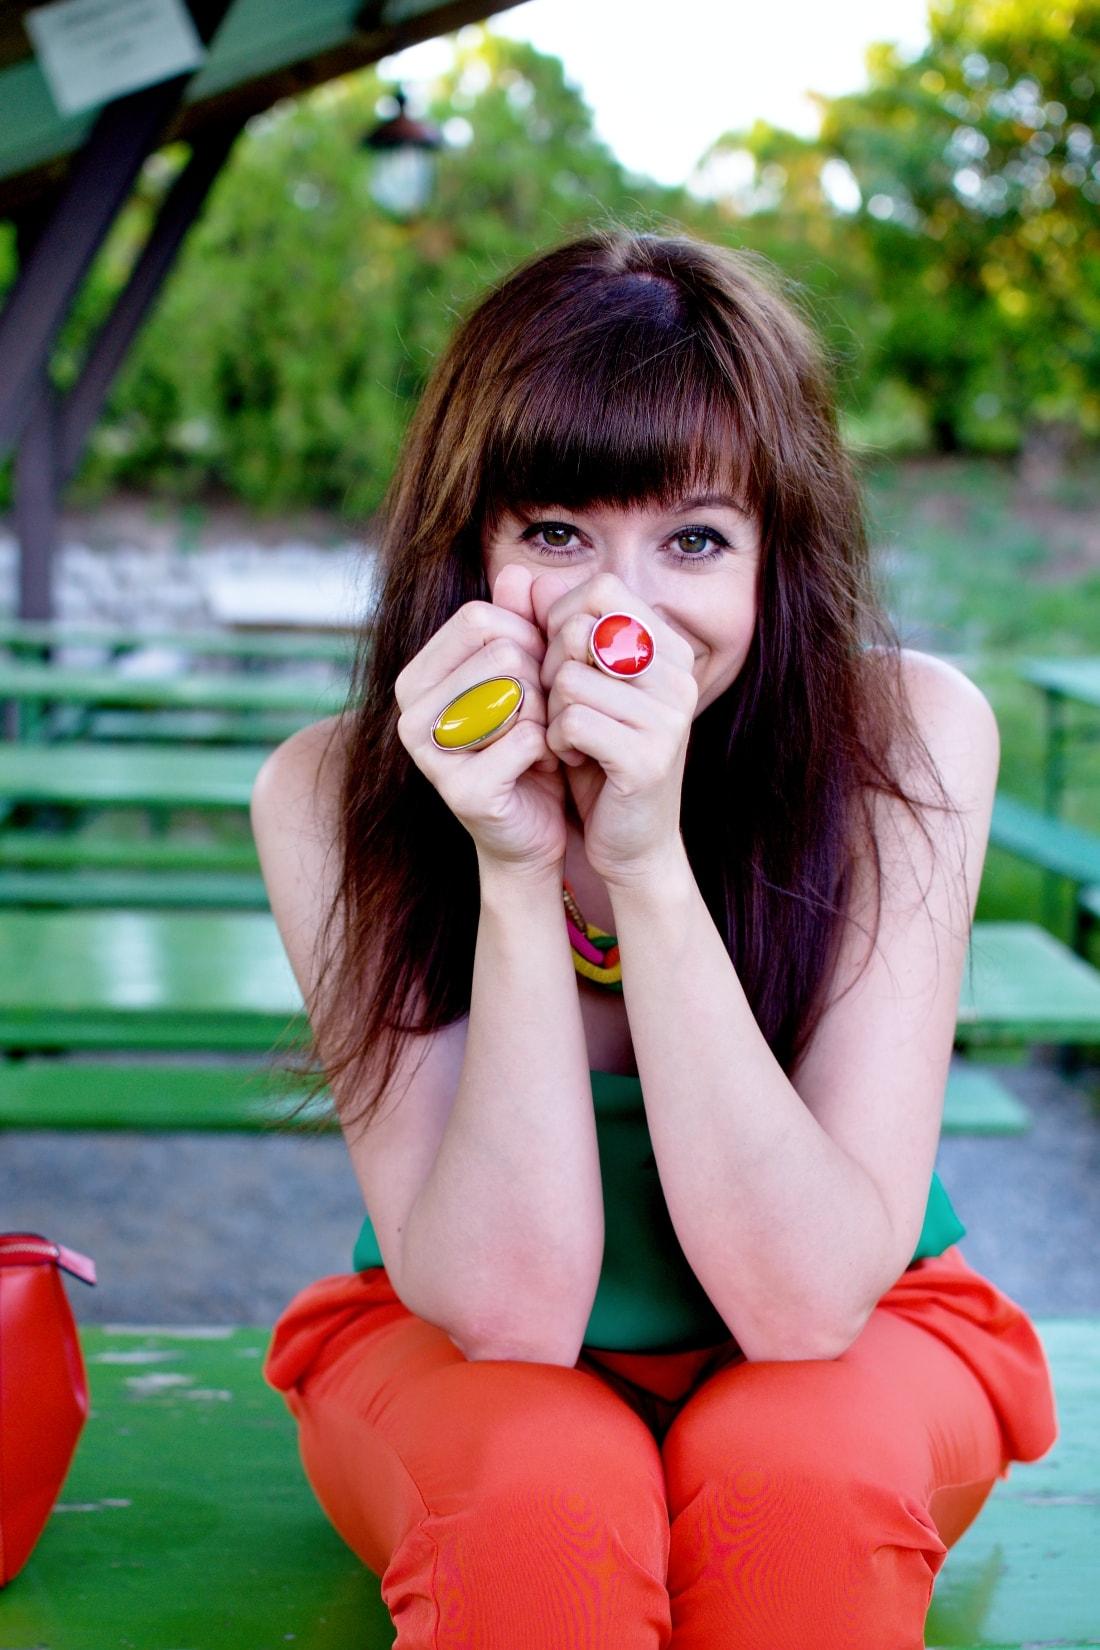 katharine-fashion-is-beautiful-blogger-summer-3